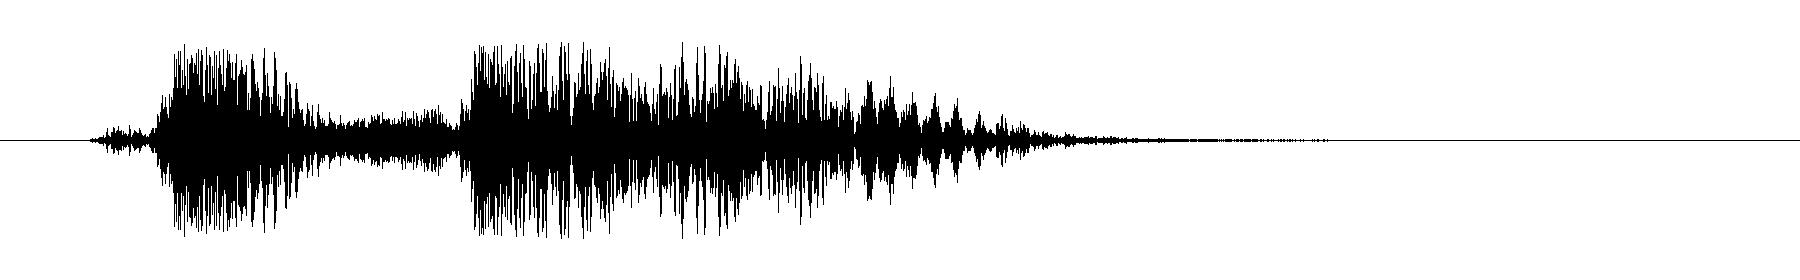 vocoder 1   perform